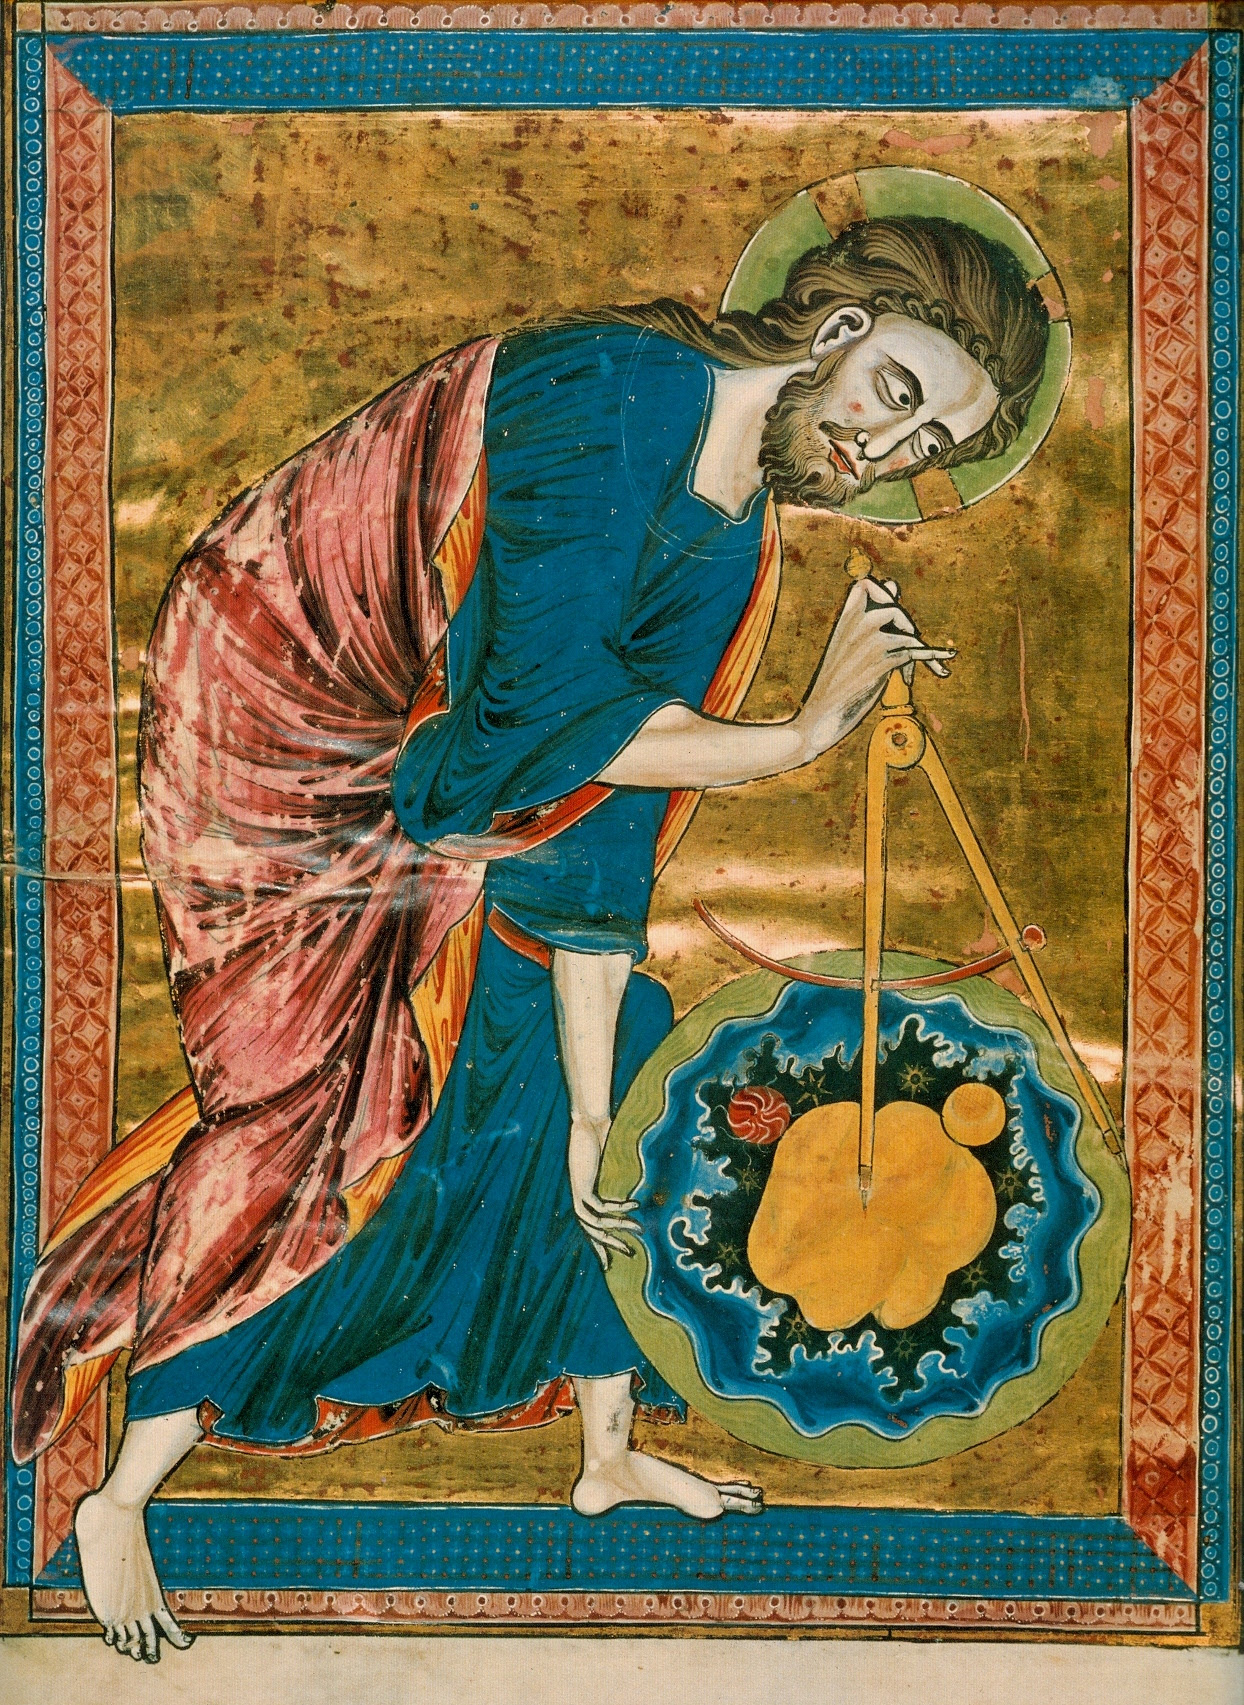 http://upload.wikimedia.org/wikipedia/commons/4/4d/God_the_Geometer.jpg